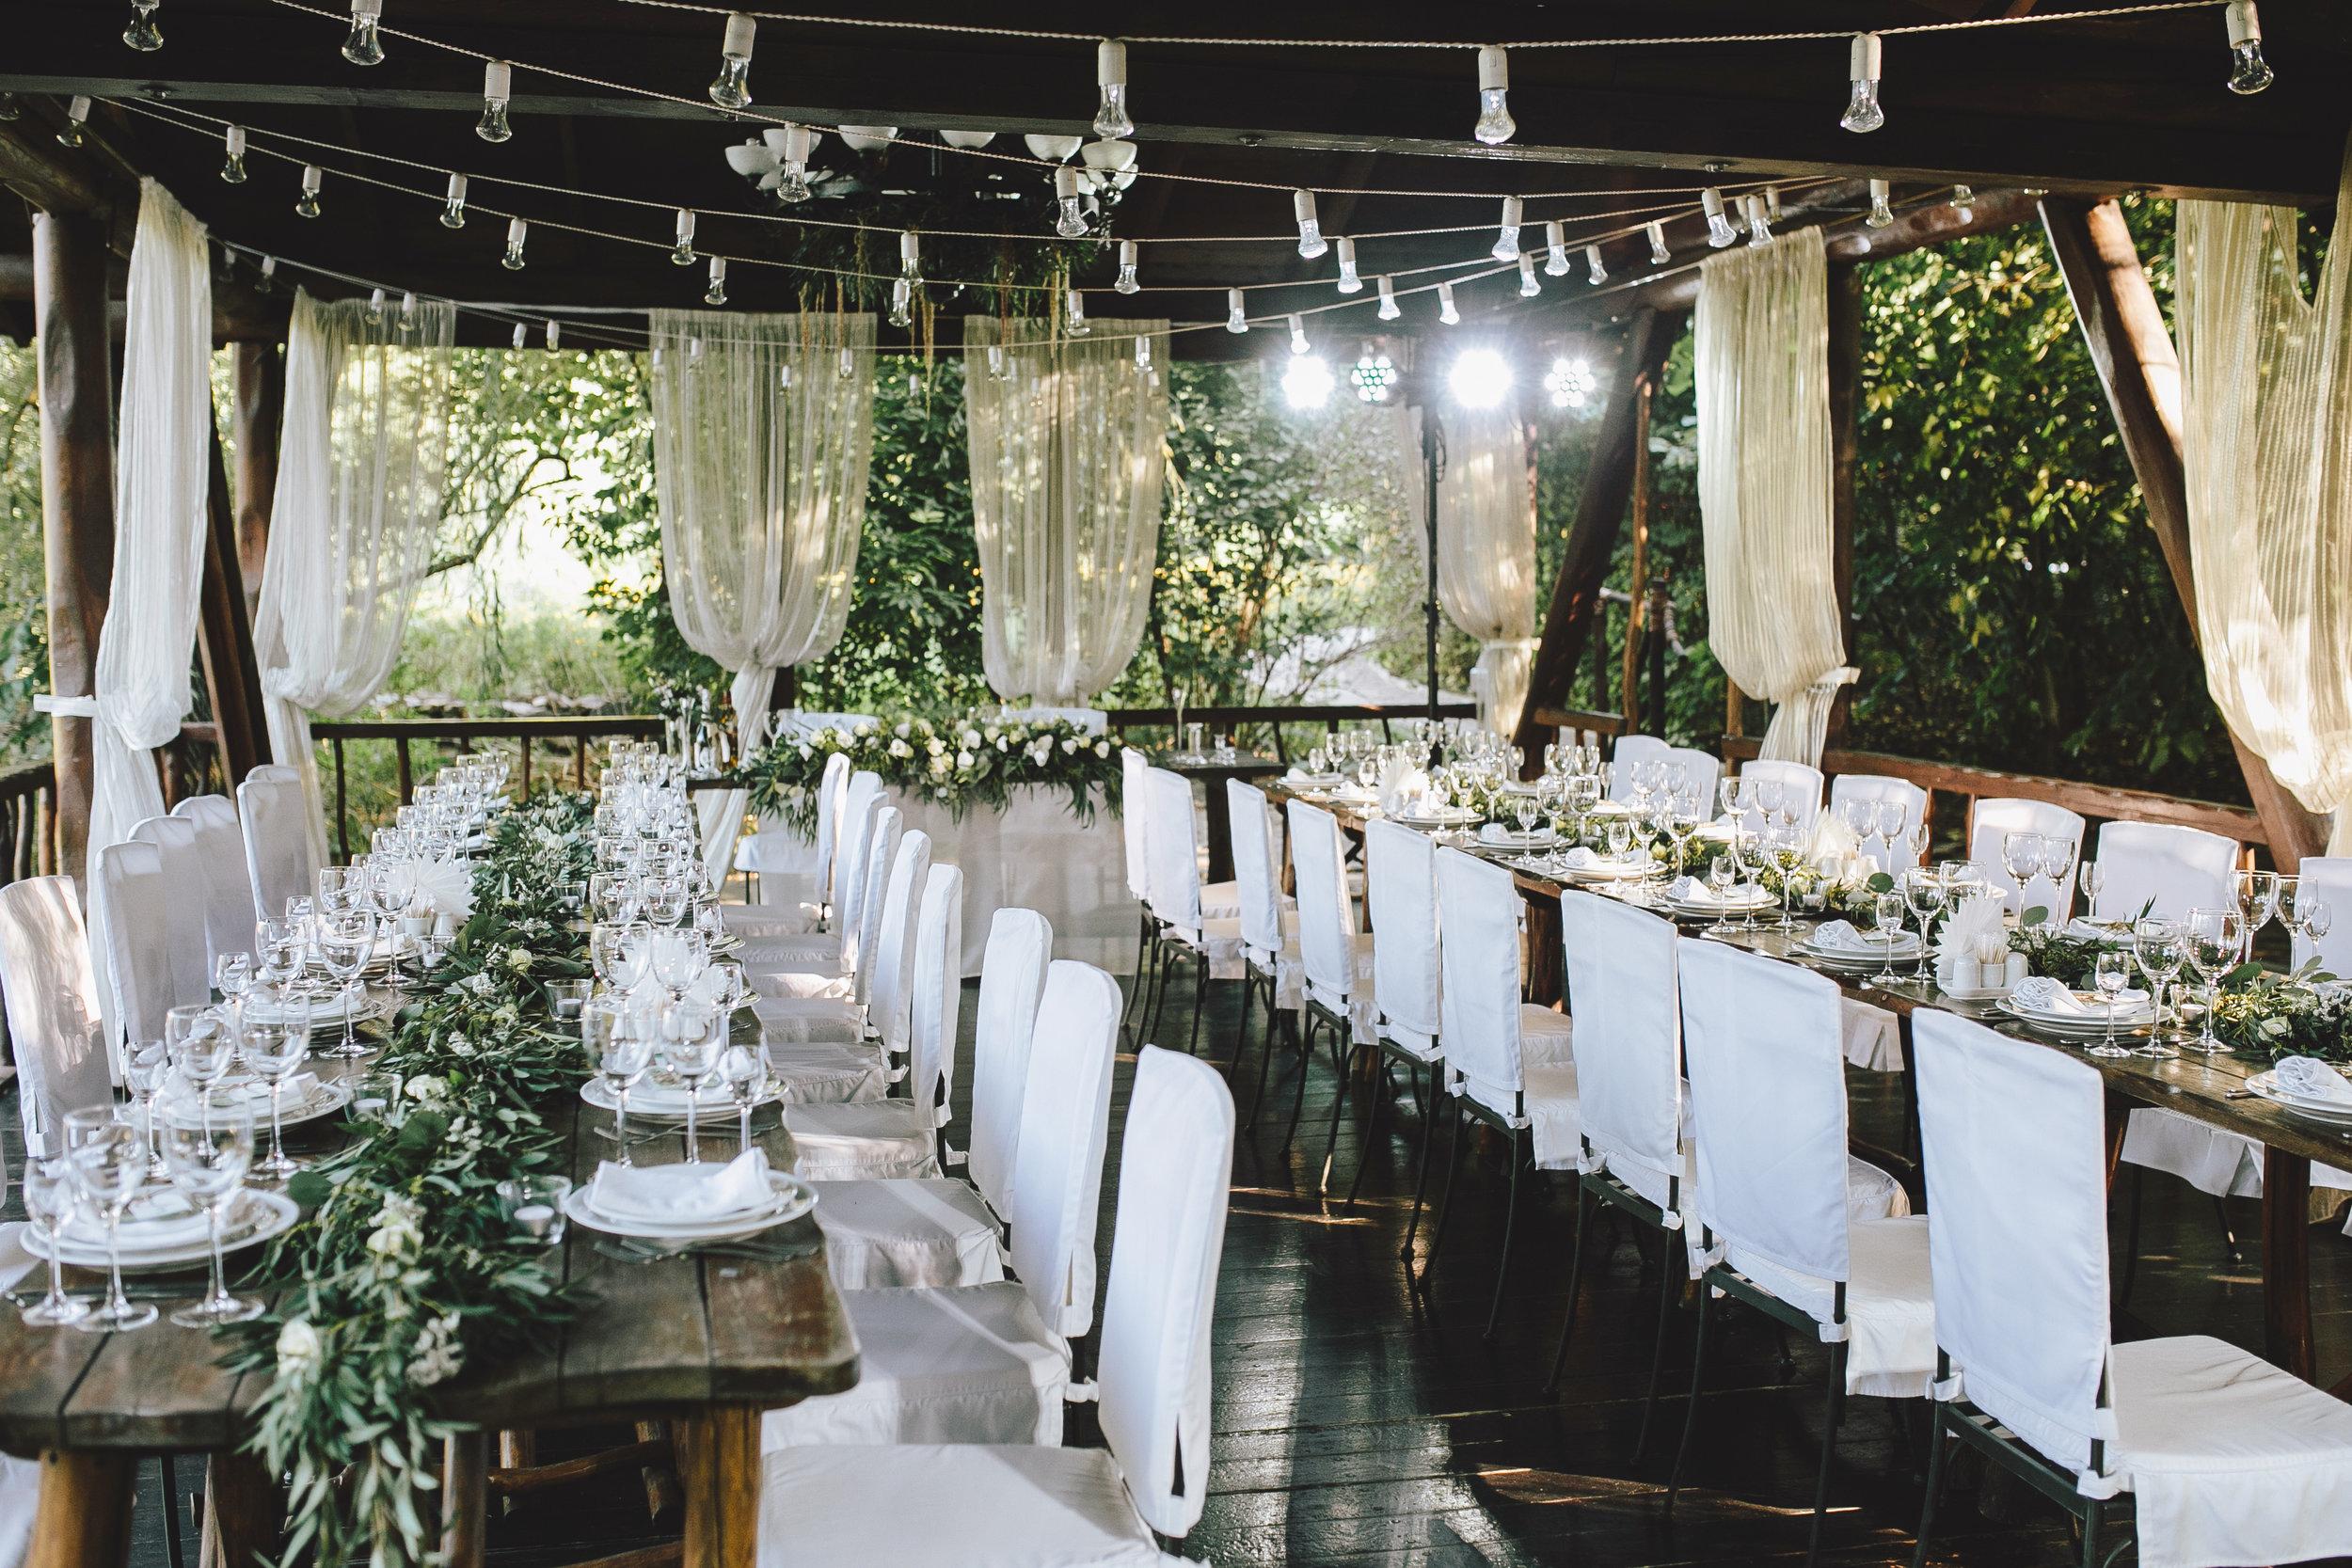 Olive Sky_Weddings Abroad37.jpeg